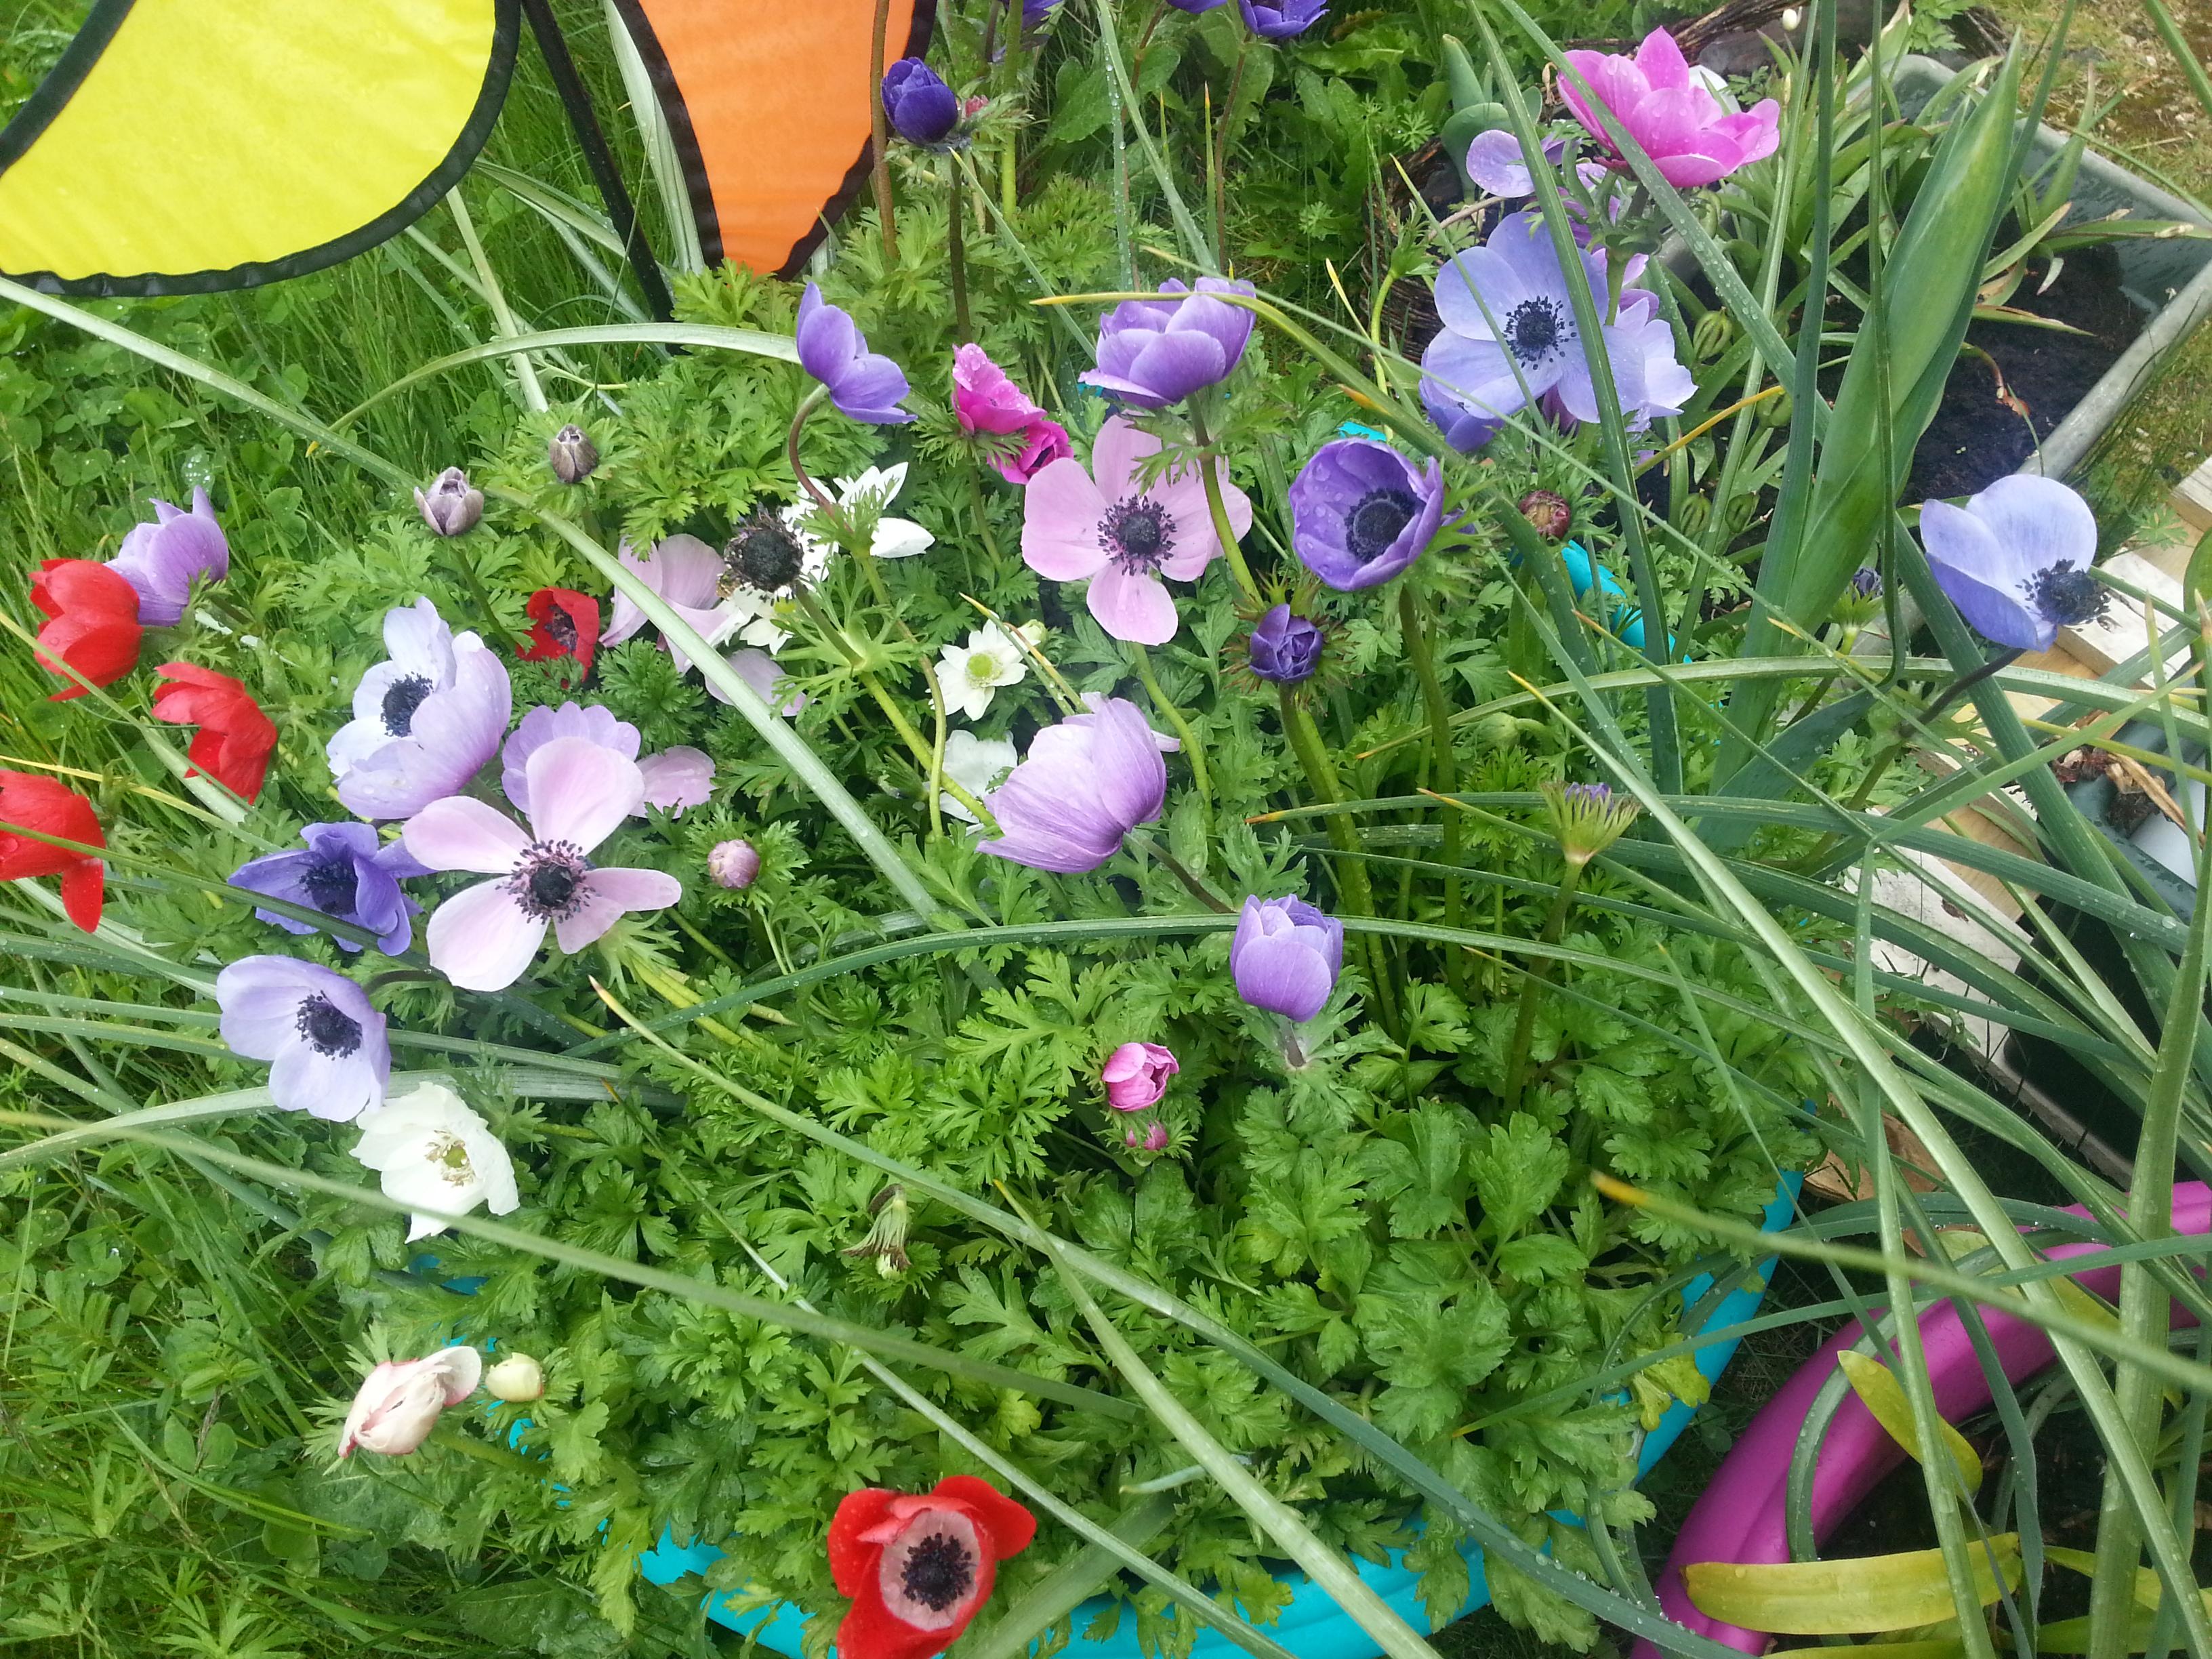 Le jardin de nanie chez bibinou for Le jardin en juin